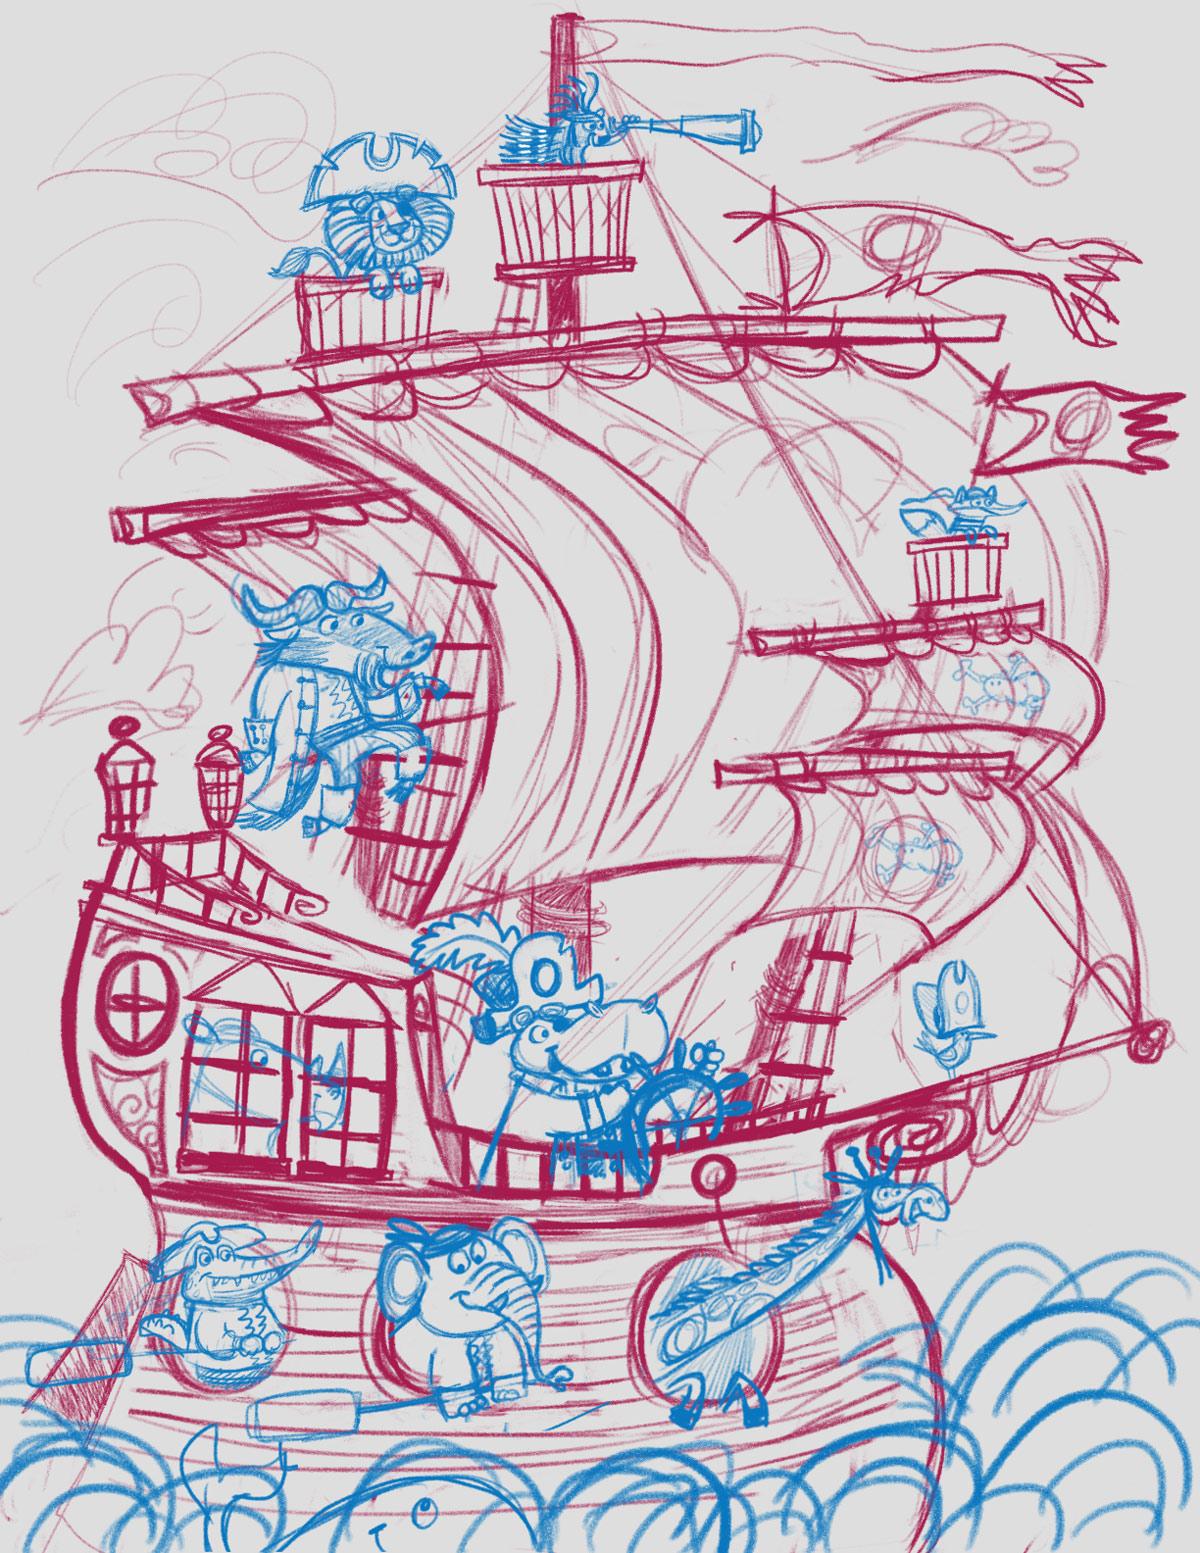 Animal Pirate Ship sketch